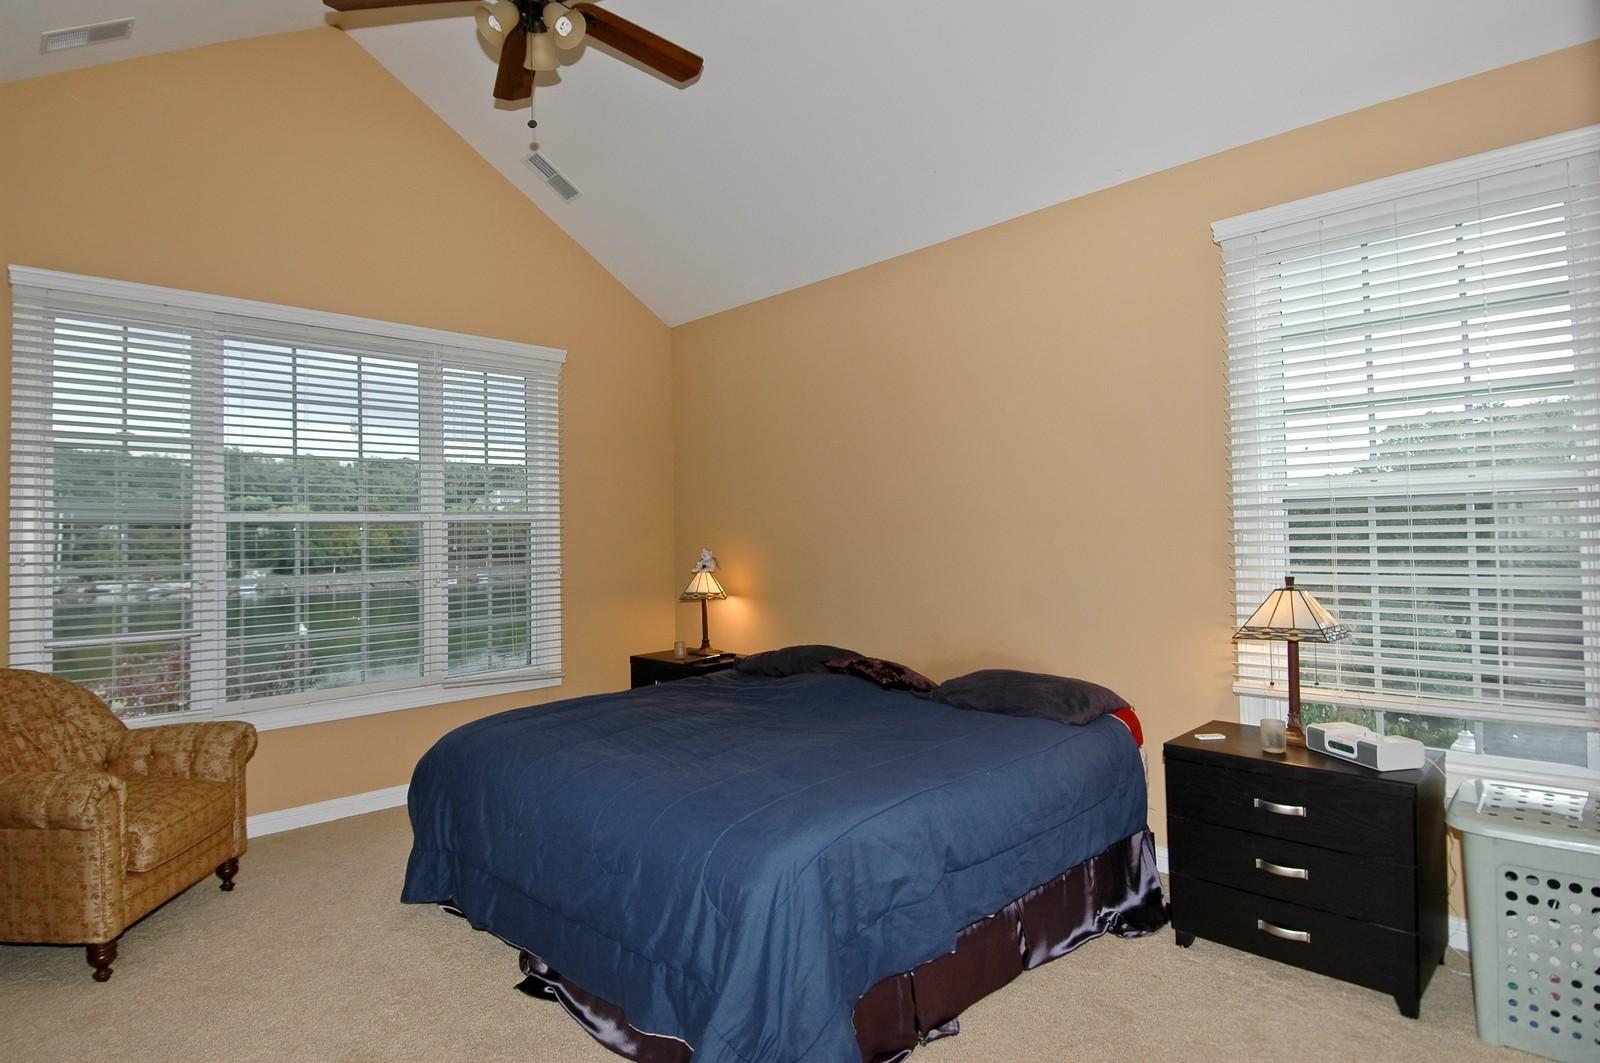 Real Estate Photography - 300 N Harrison, Algonquin, IL, 60102 - Master Bedroom